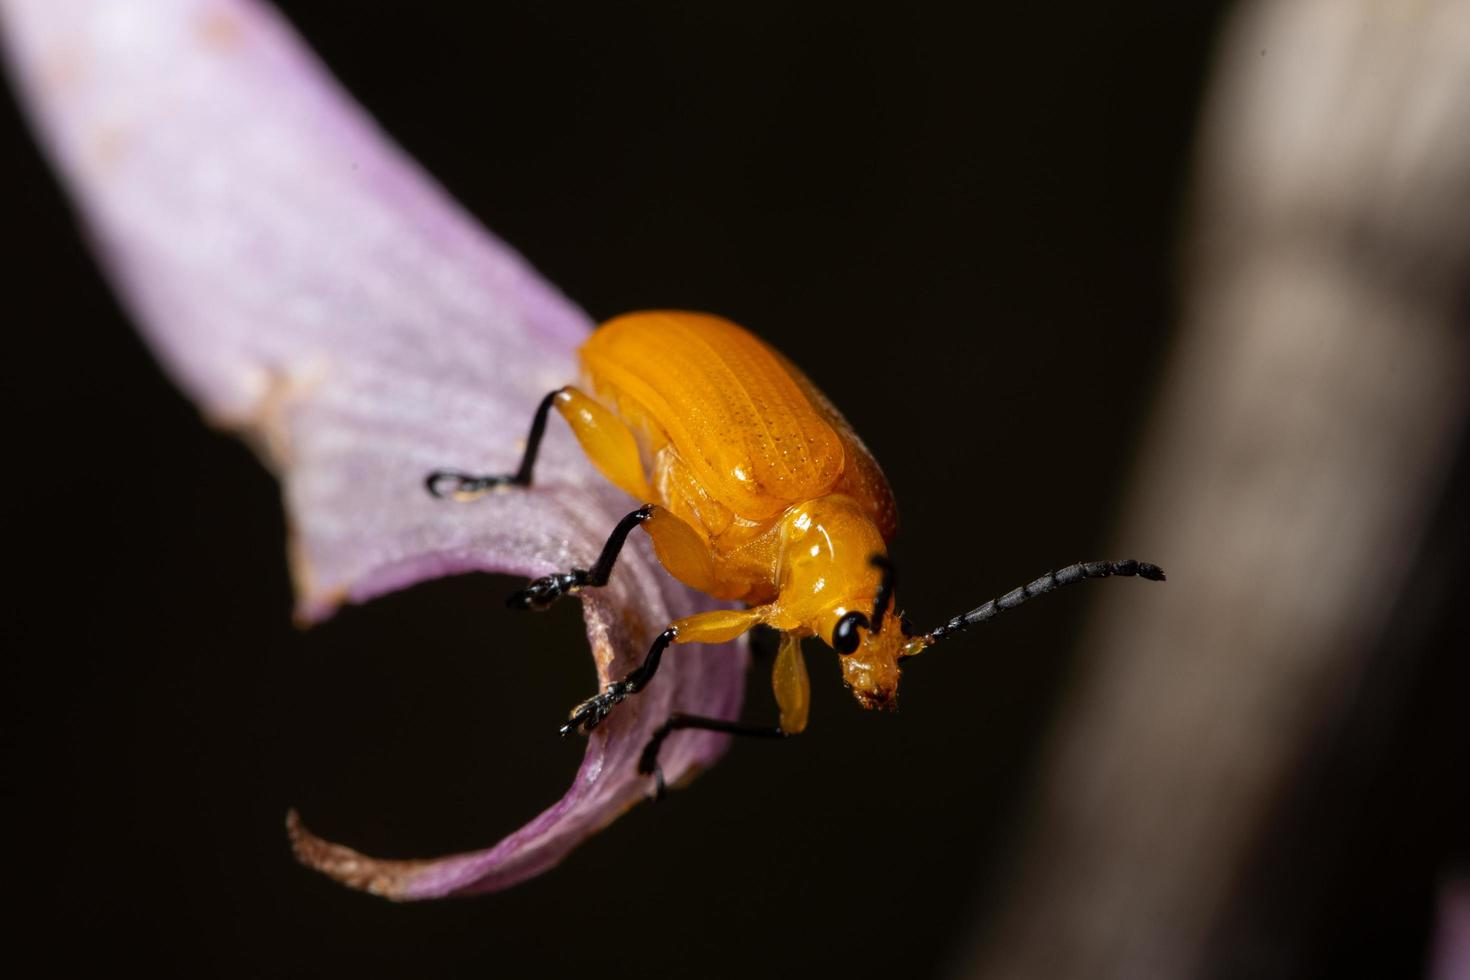 coleottero giallo, macro foto